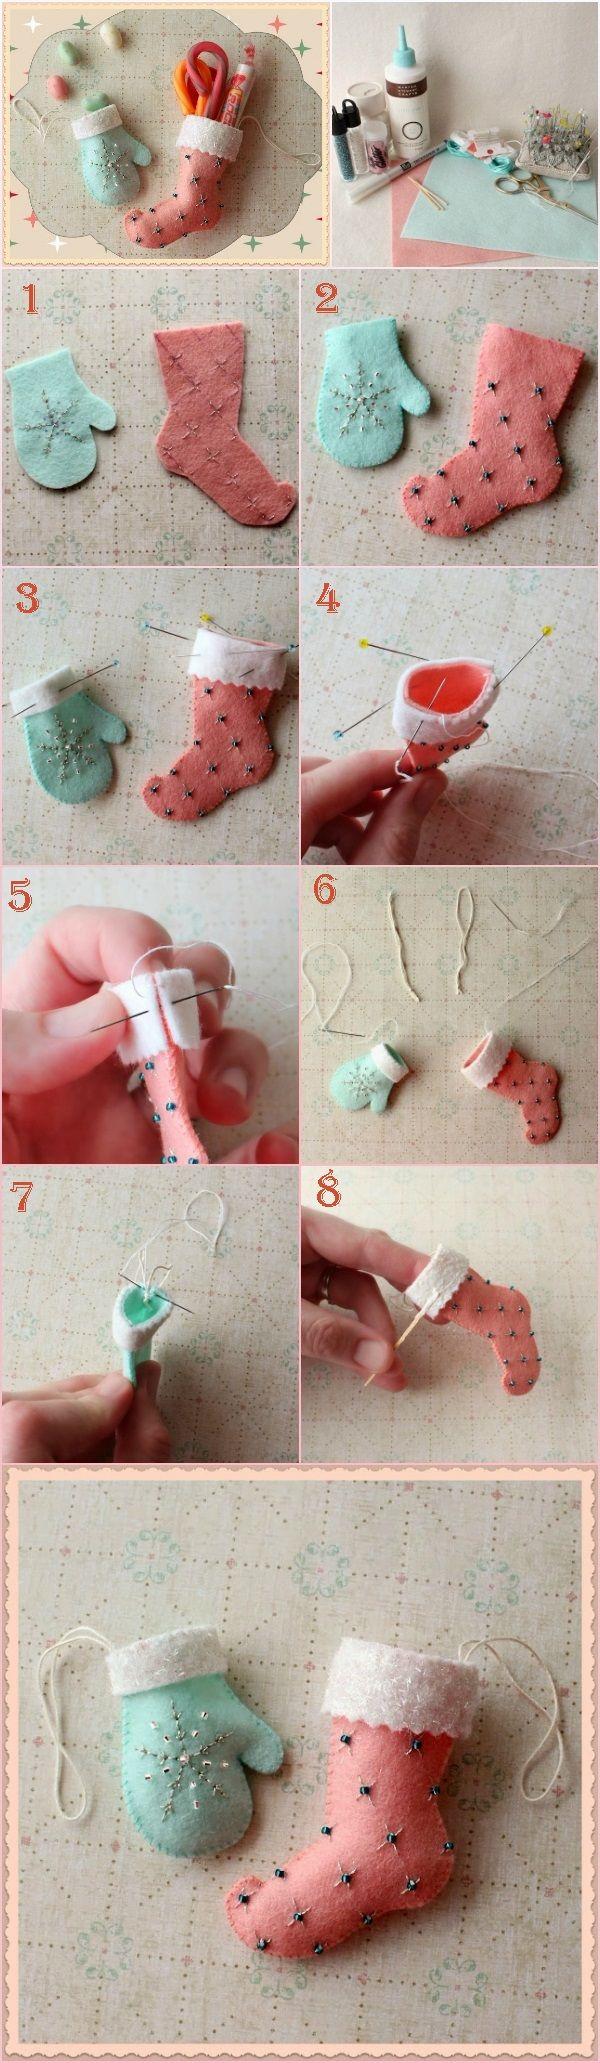 Christmas Stocking and Glove Ornaments   DIY Fun Tips